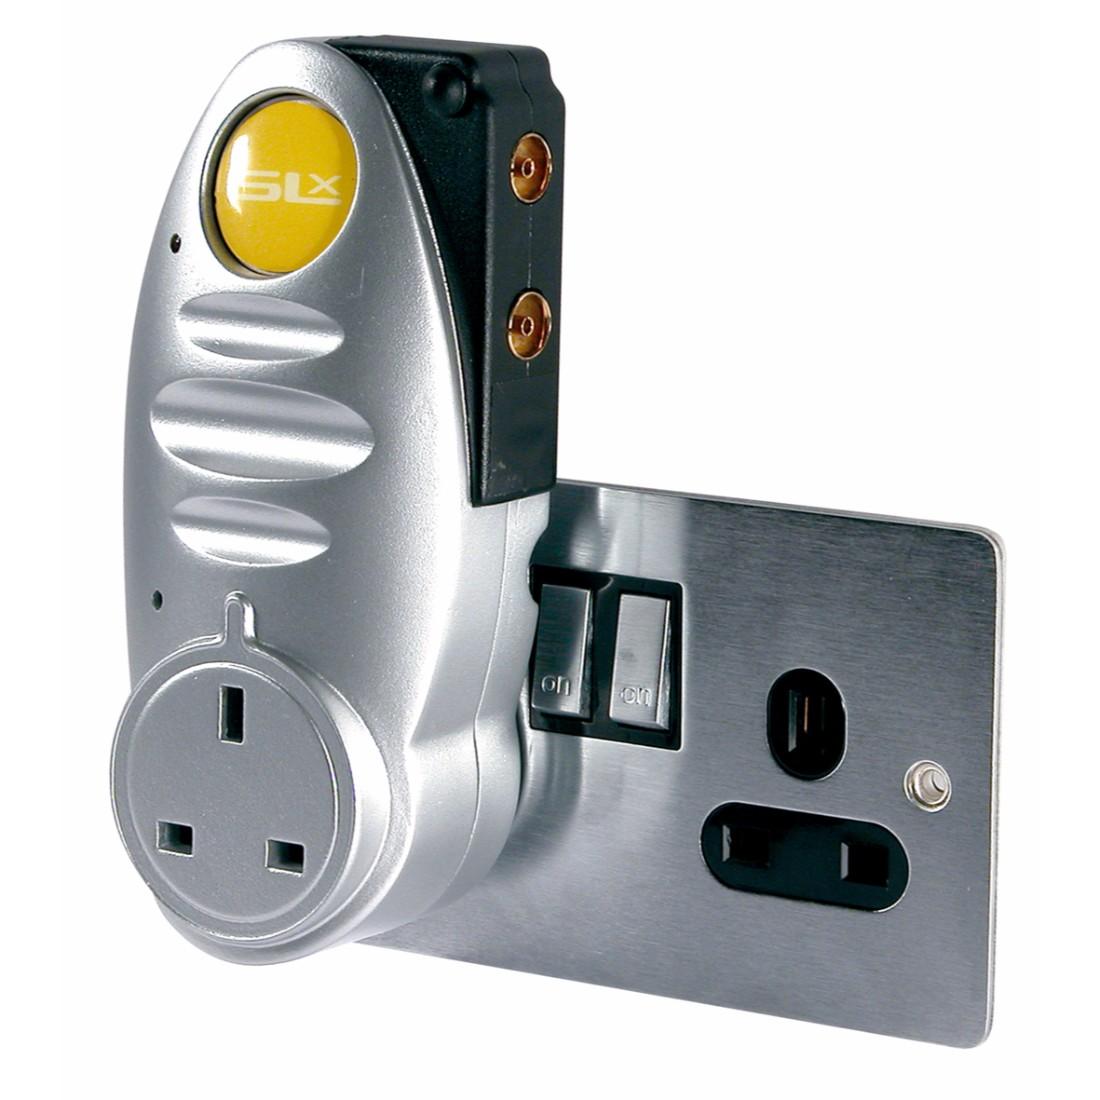 Slx Gold 1 Way Plug Thru Signal Booster 4g Compatible